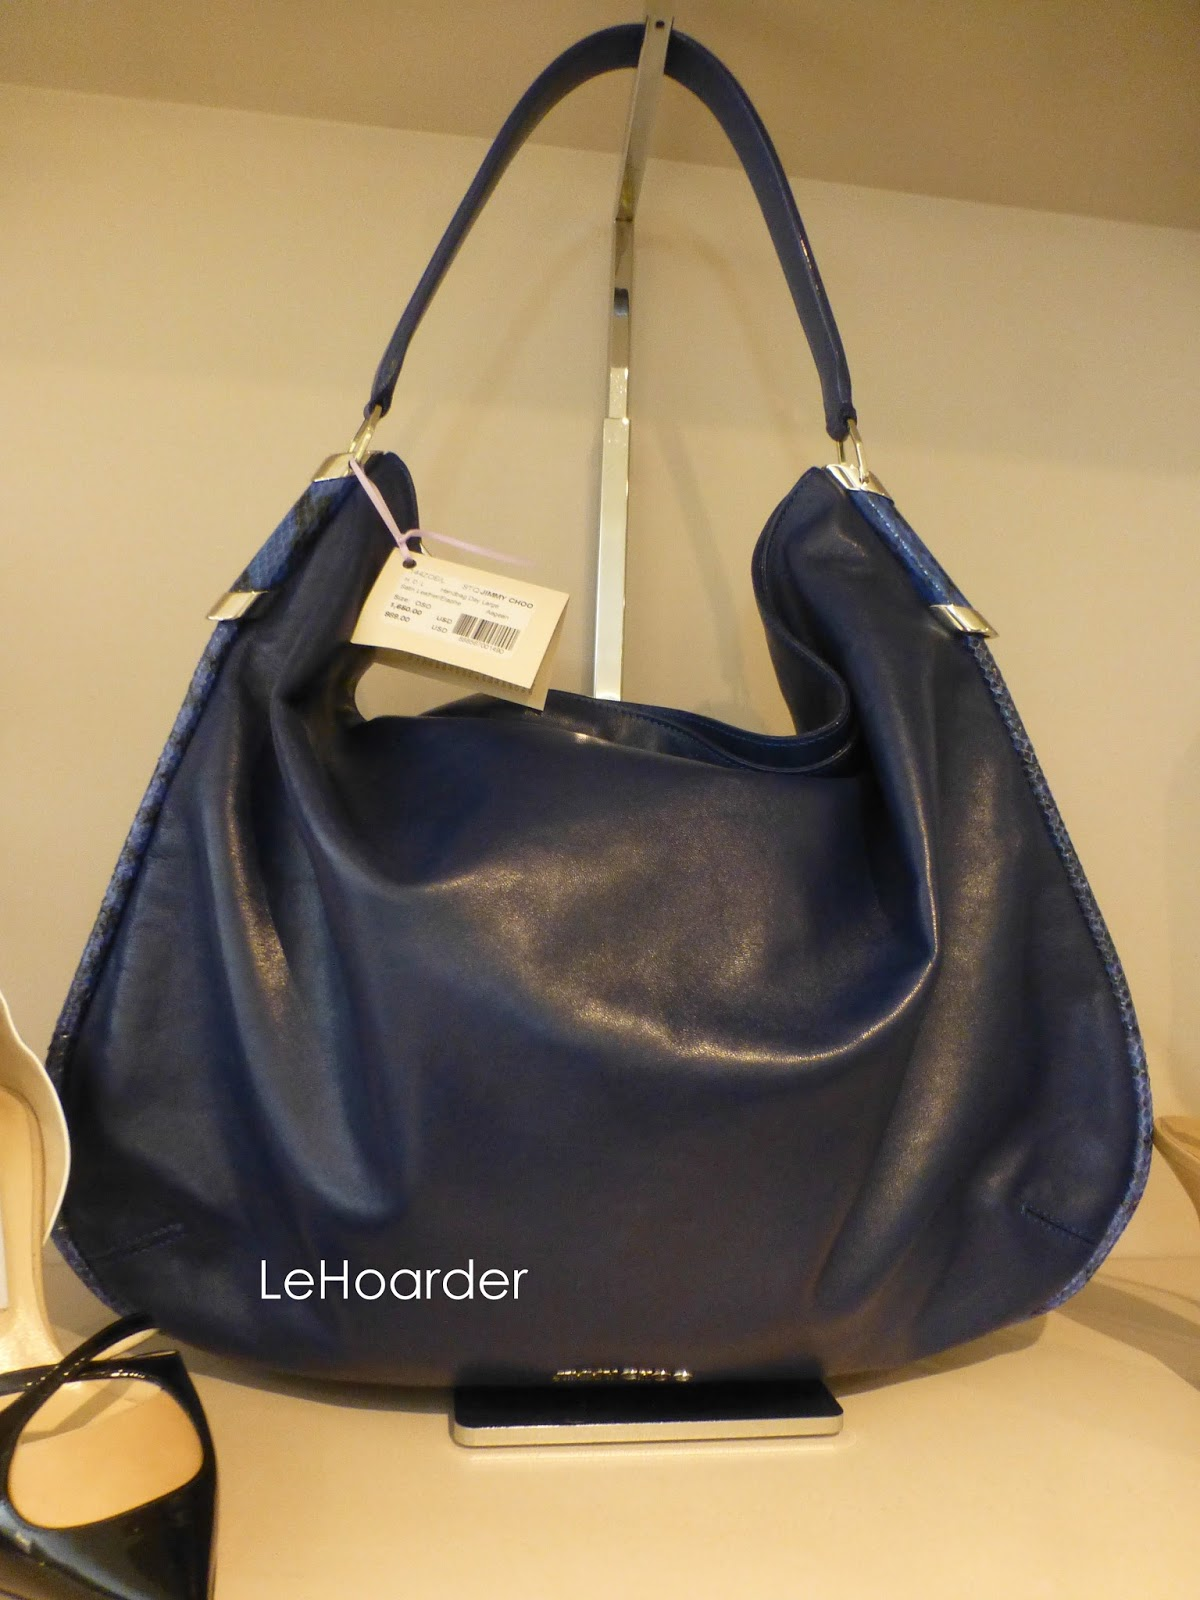 cheap jimmy choo bags ebay simply accessories rh simplyaccessories com